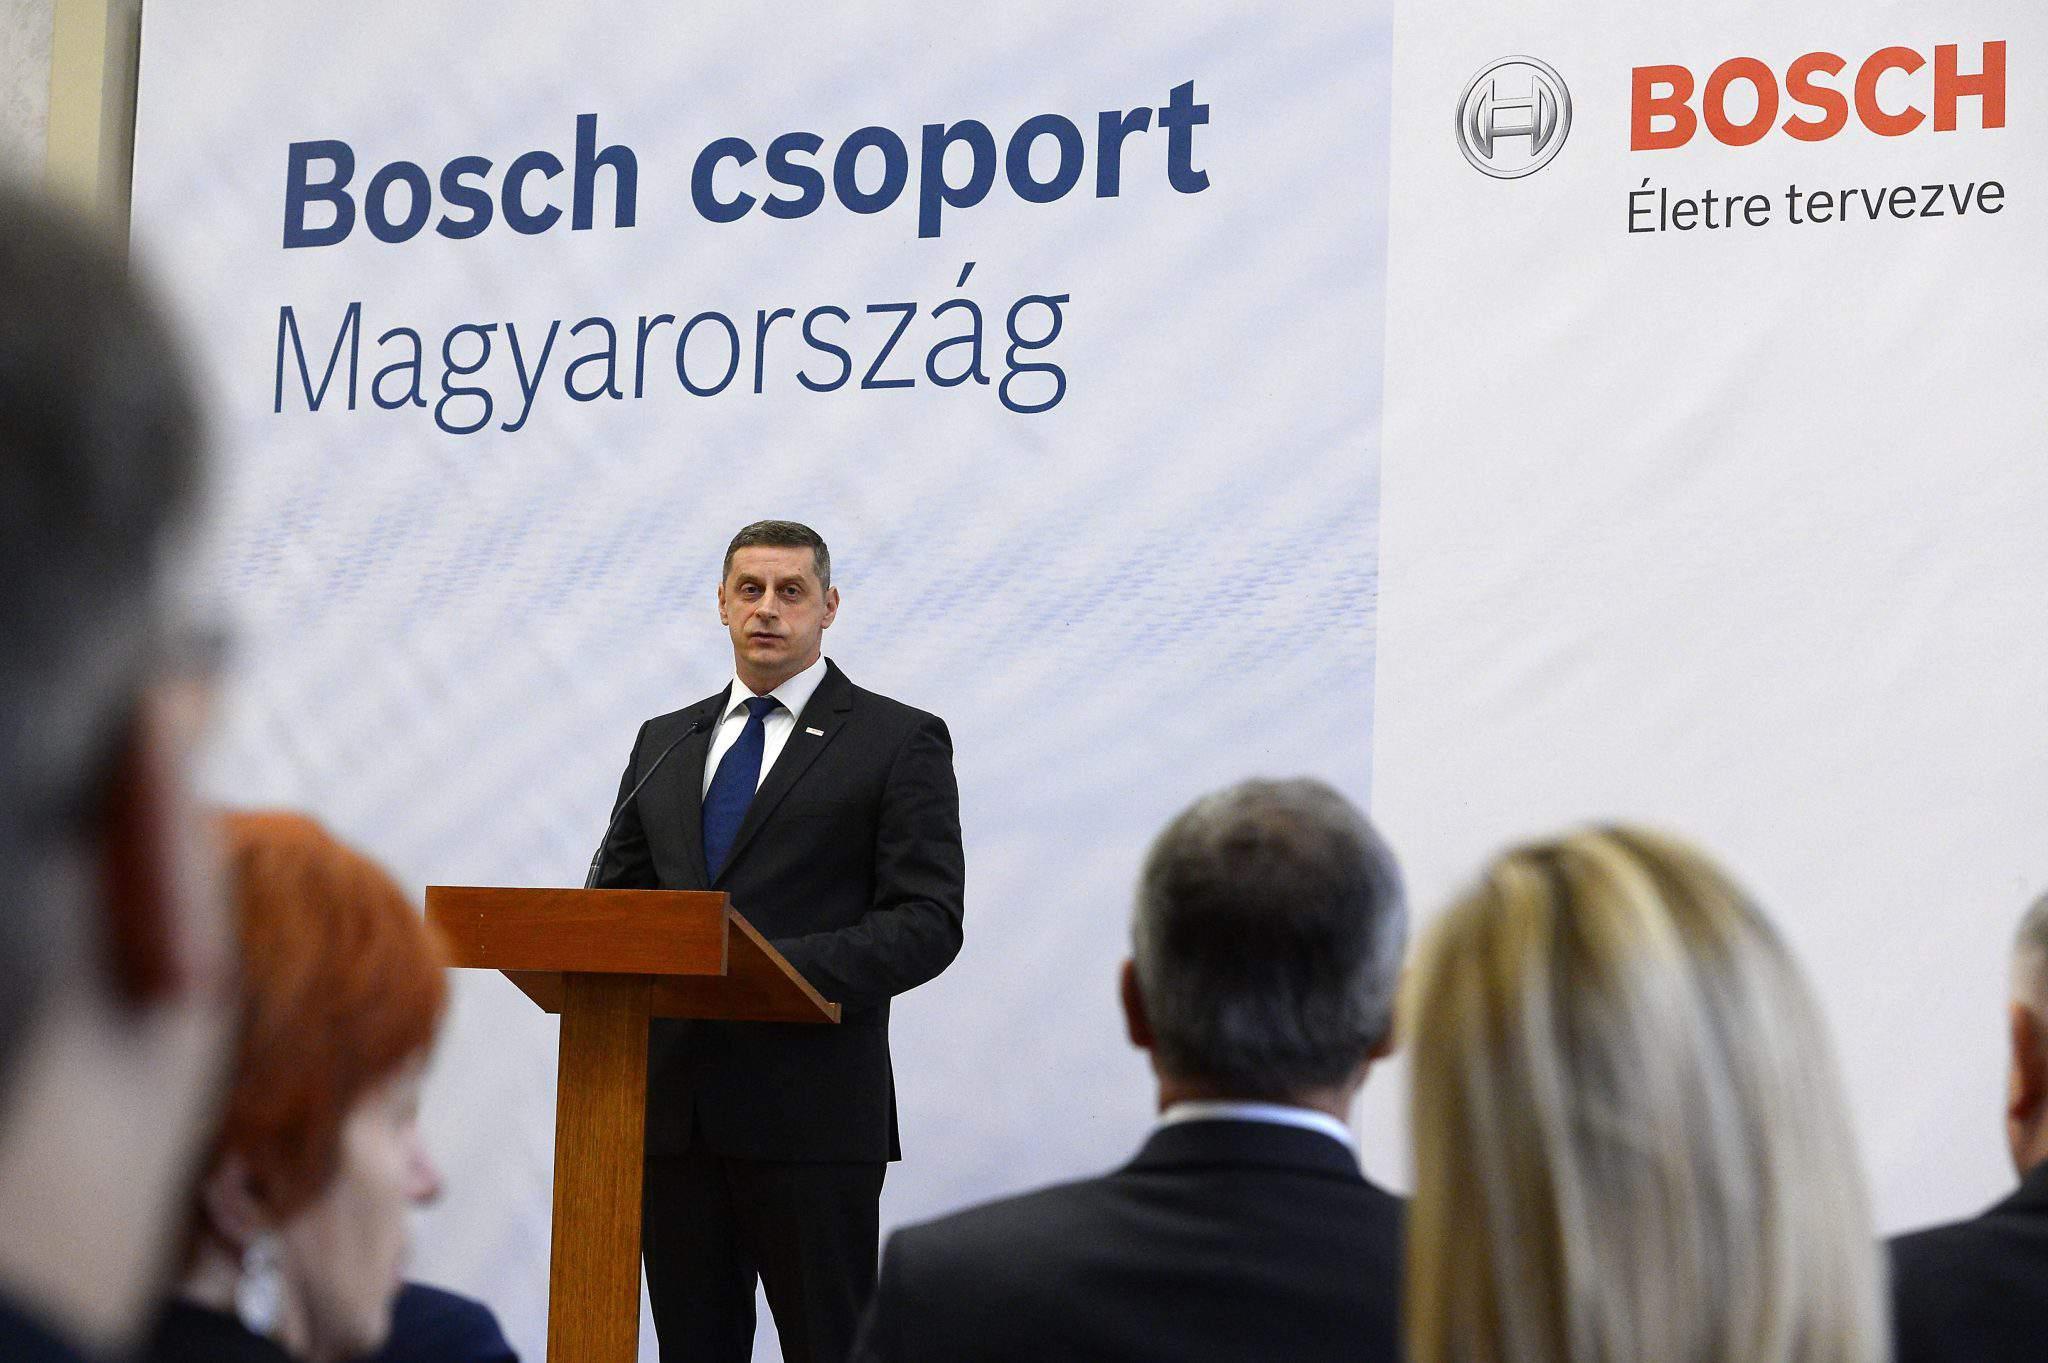 Bosch Hungary